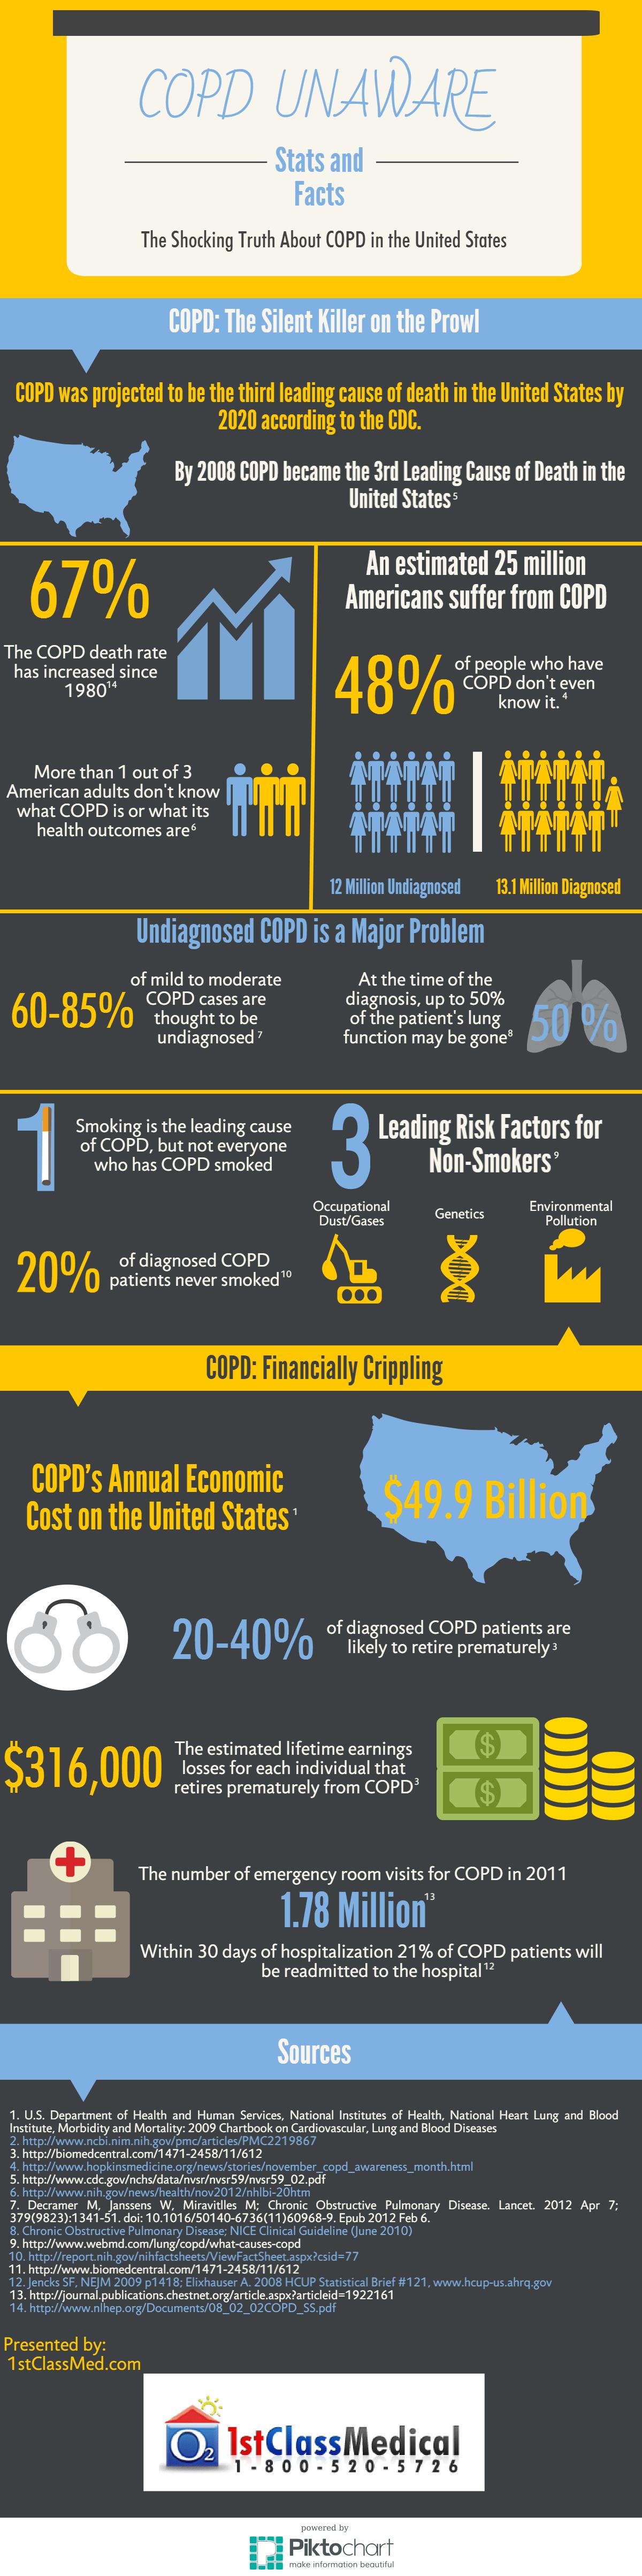 COPD_Unaware_1_2